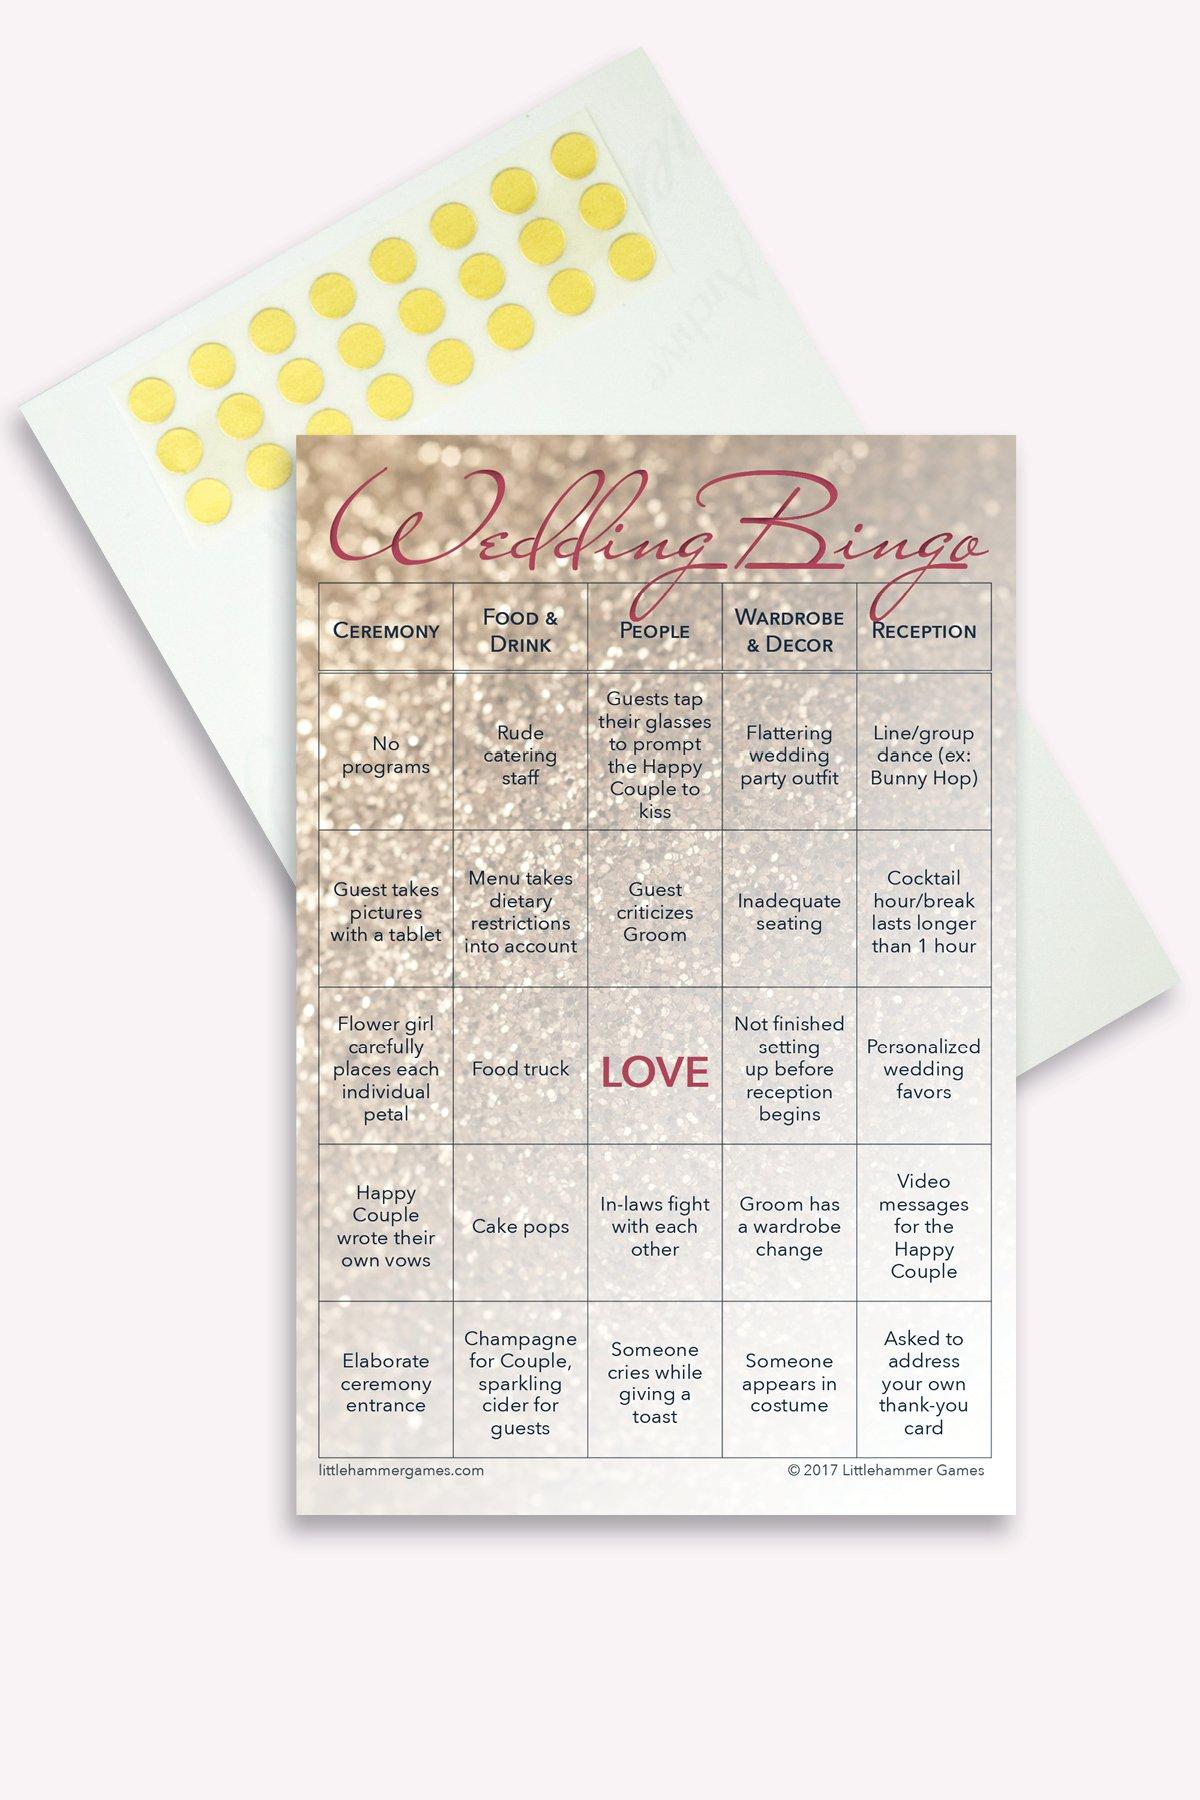 Wedding bingo grooms edition card printed set with gold